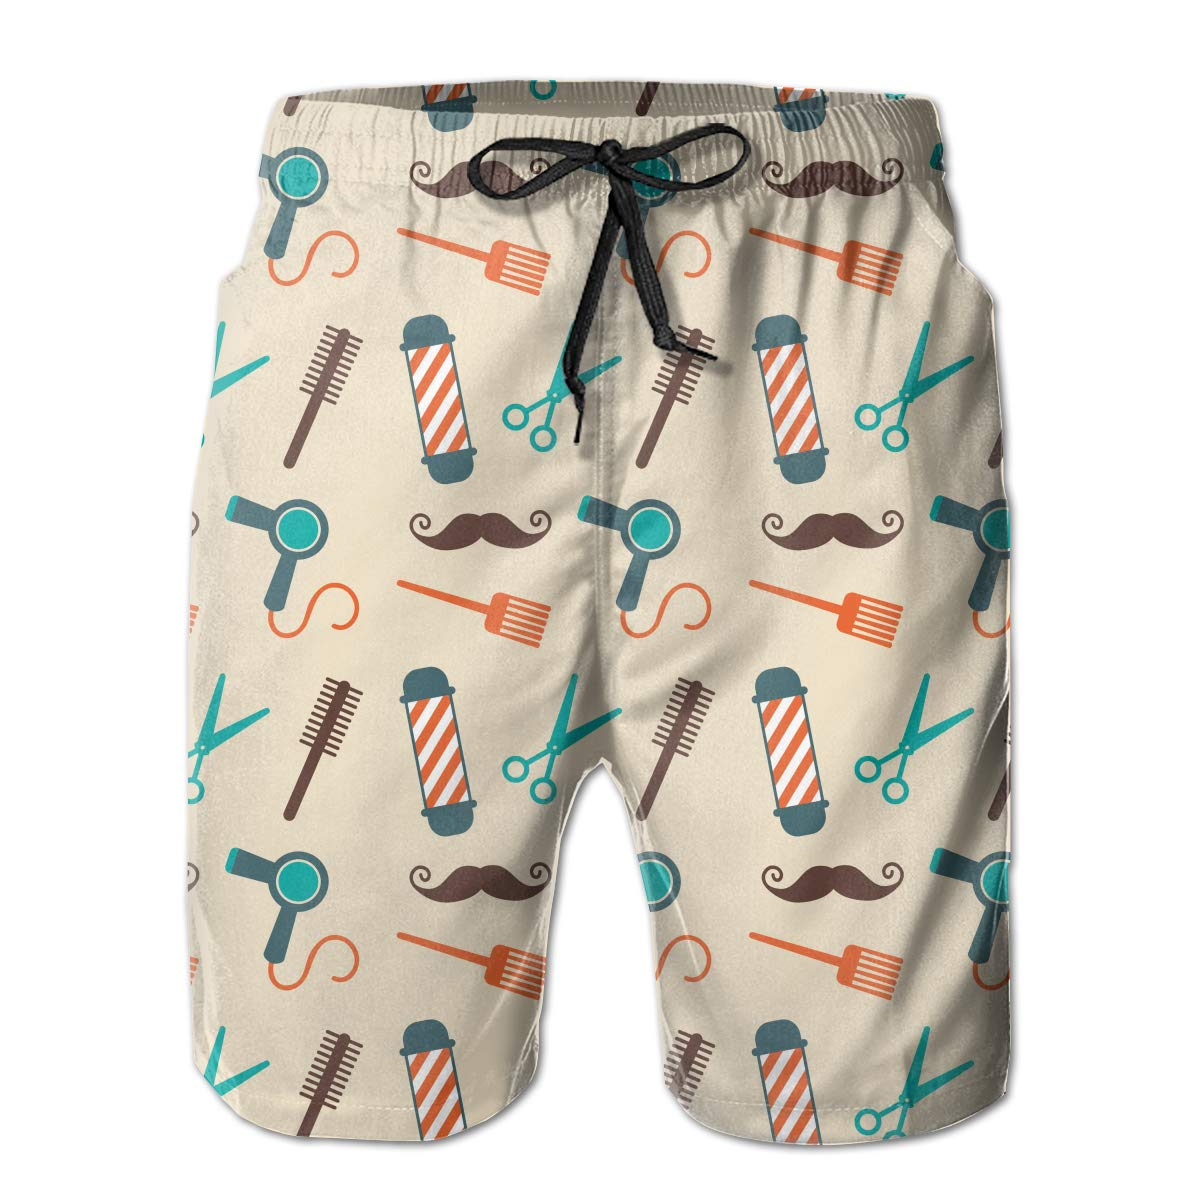 YongColer Mens Casual Swim Trunks Medium Length Summer Drawstring Beach Shorts Surfing Pants Bathing Suits-Barber Tools